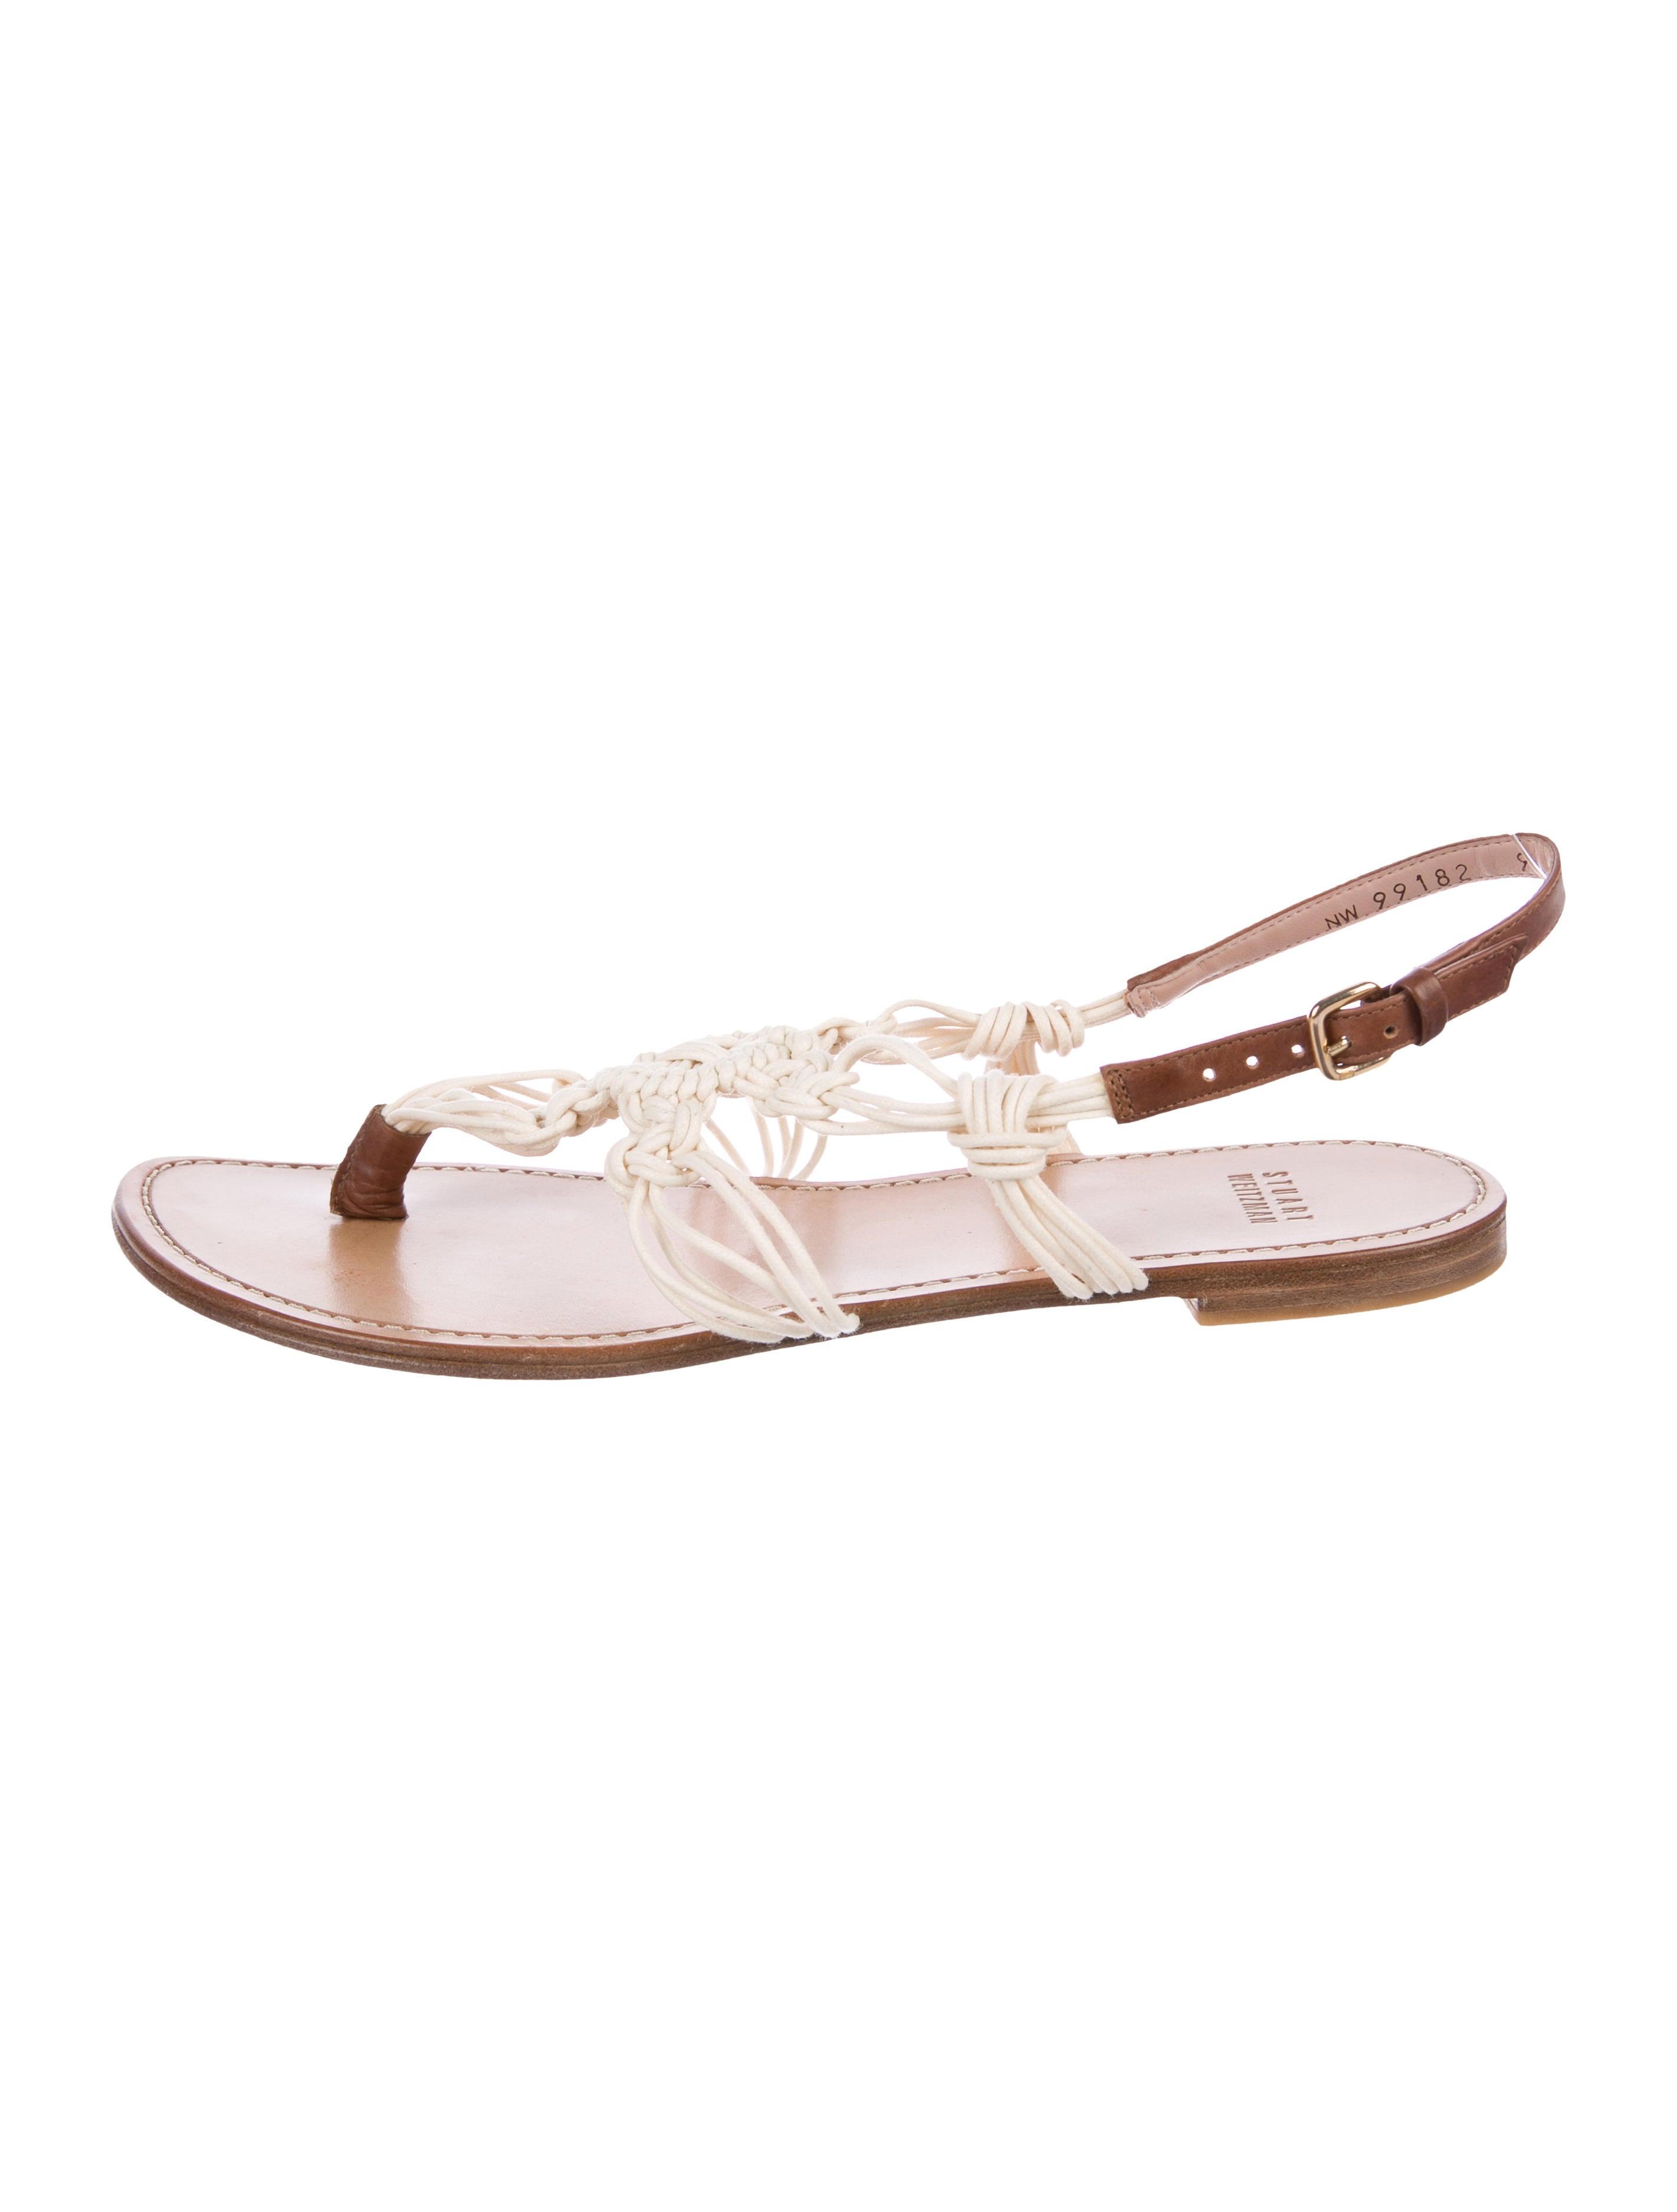 88119f36d1e Stuart Weitzman Crochet Thong Sandals - Shoes - WSU44285